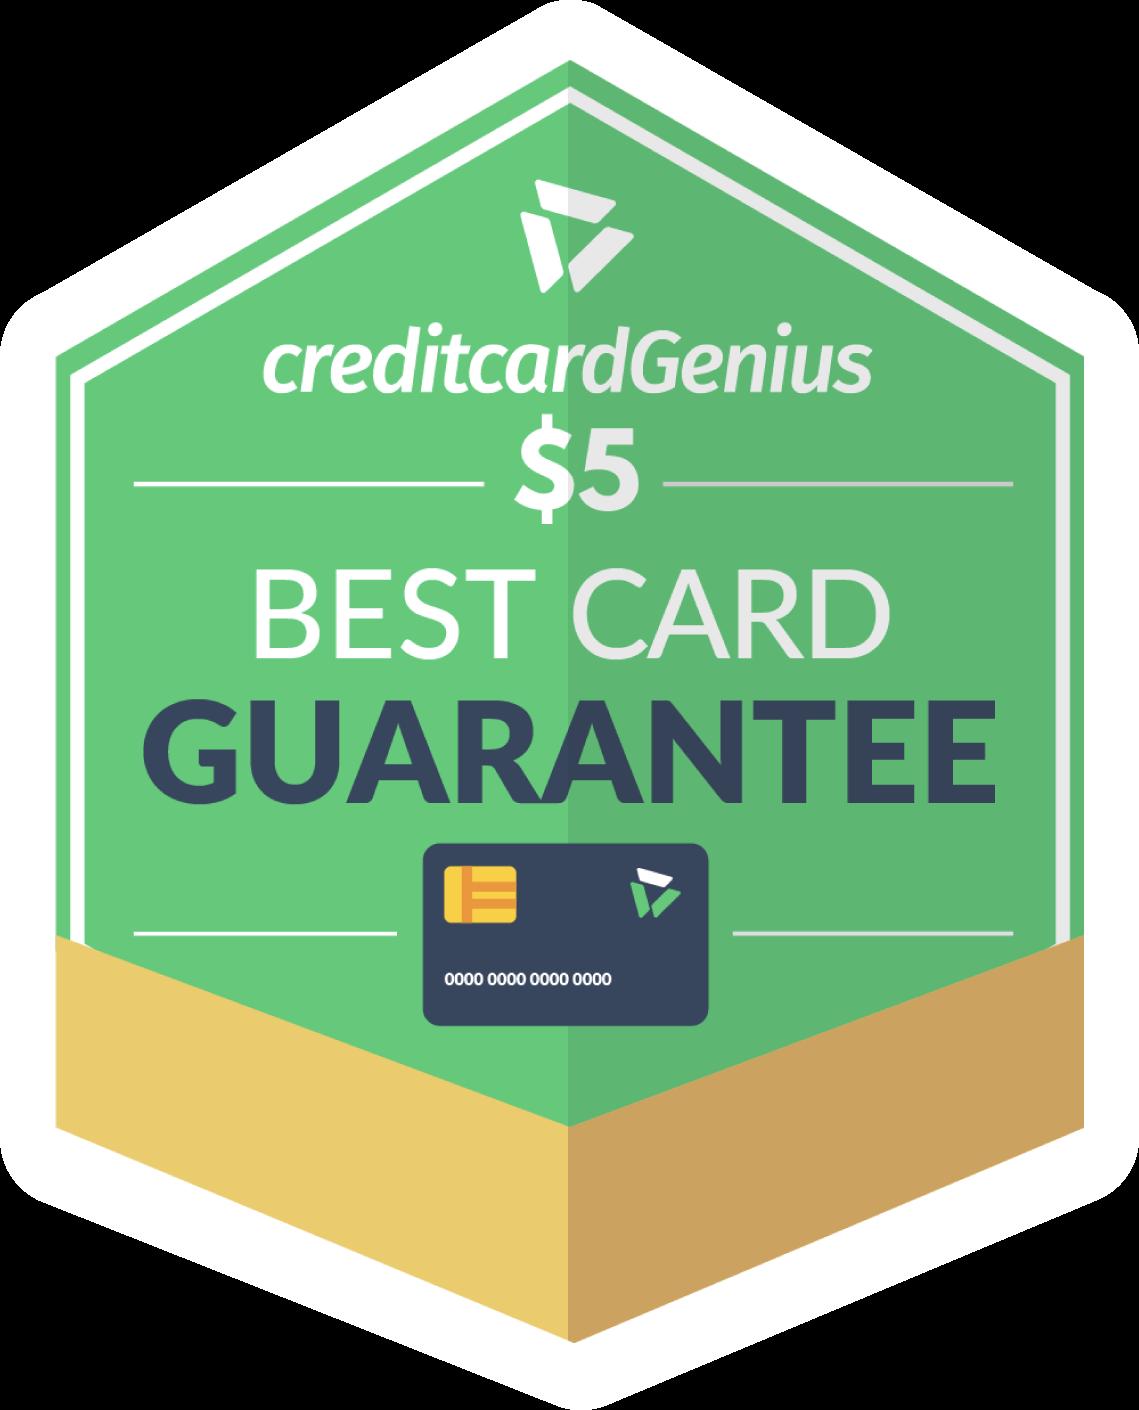 Best Card Guarantee